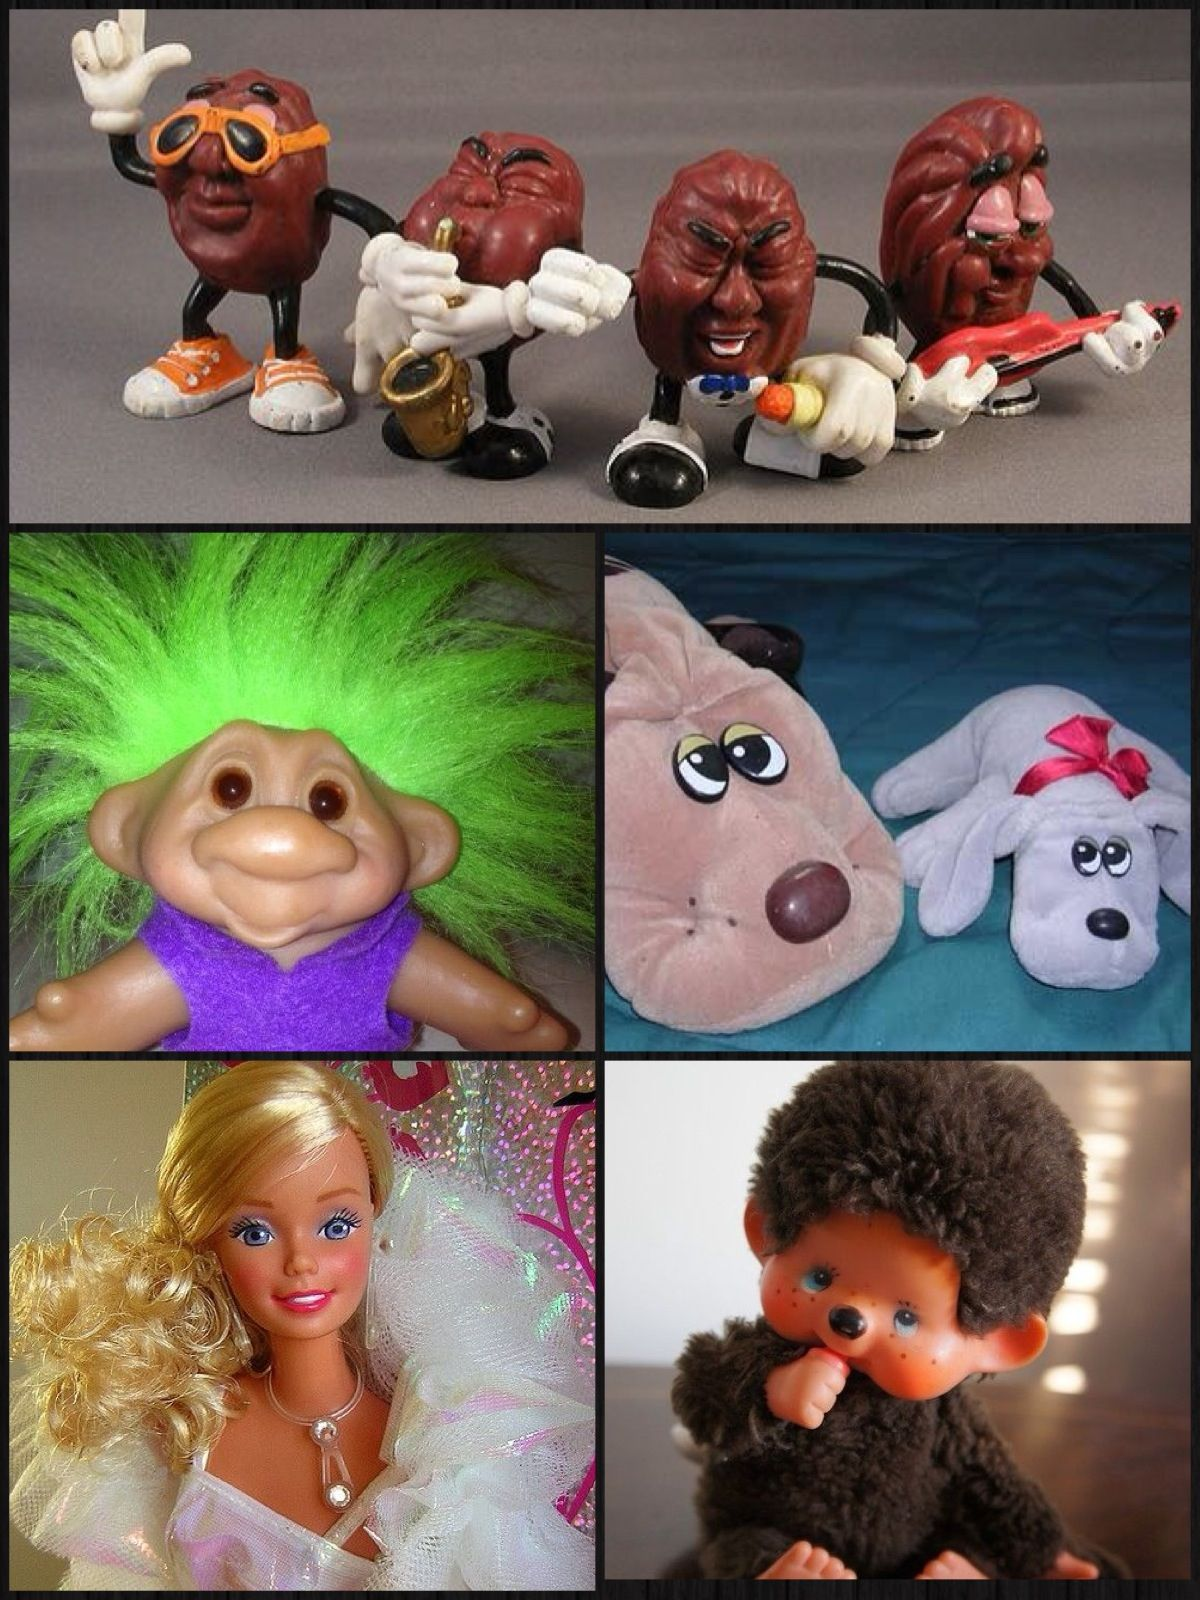 1980s fads California raisins Trolls Pound Puppies Barbie